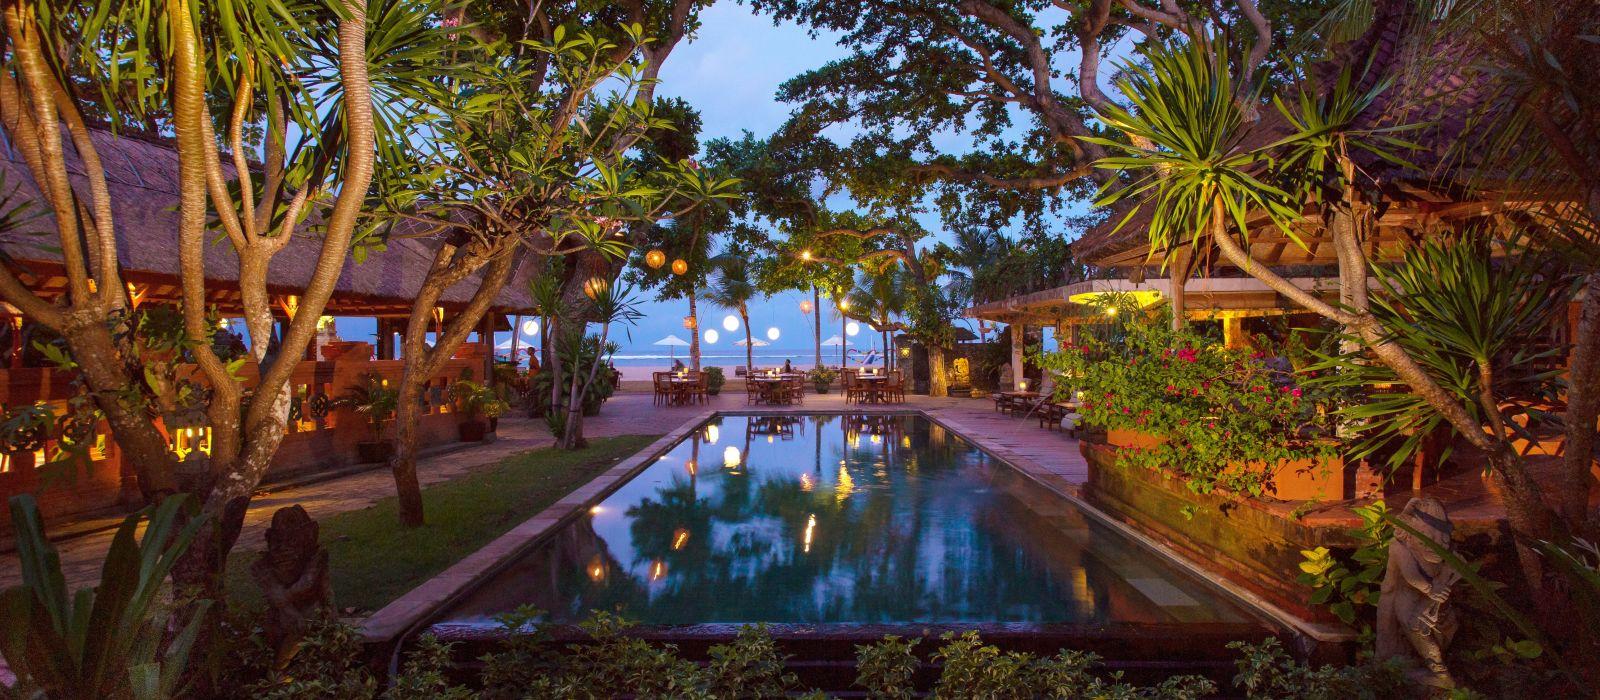 Hotel The Tandjung Sari Indonesia